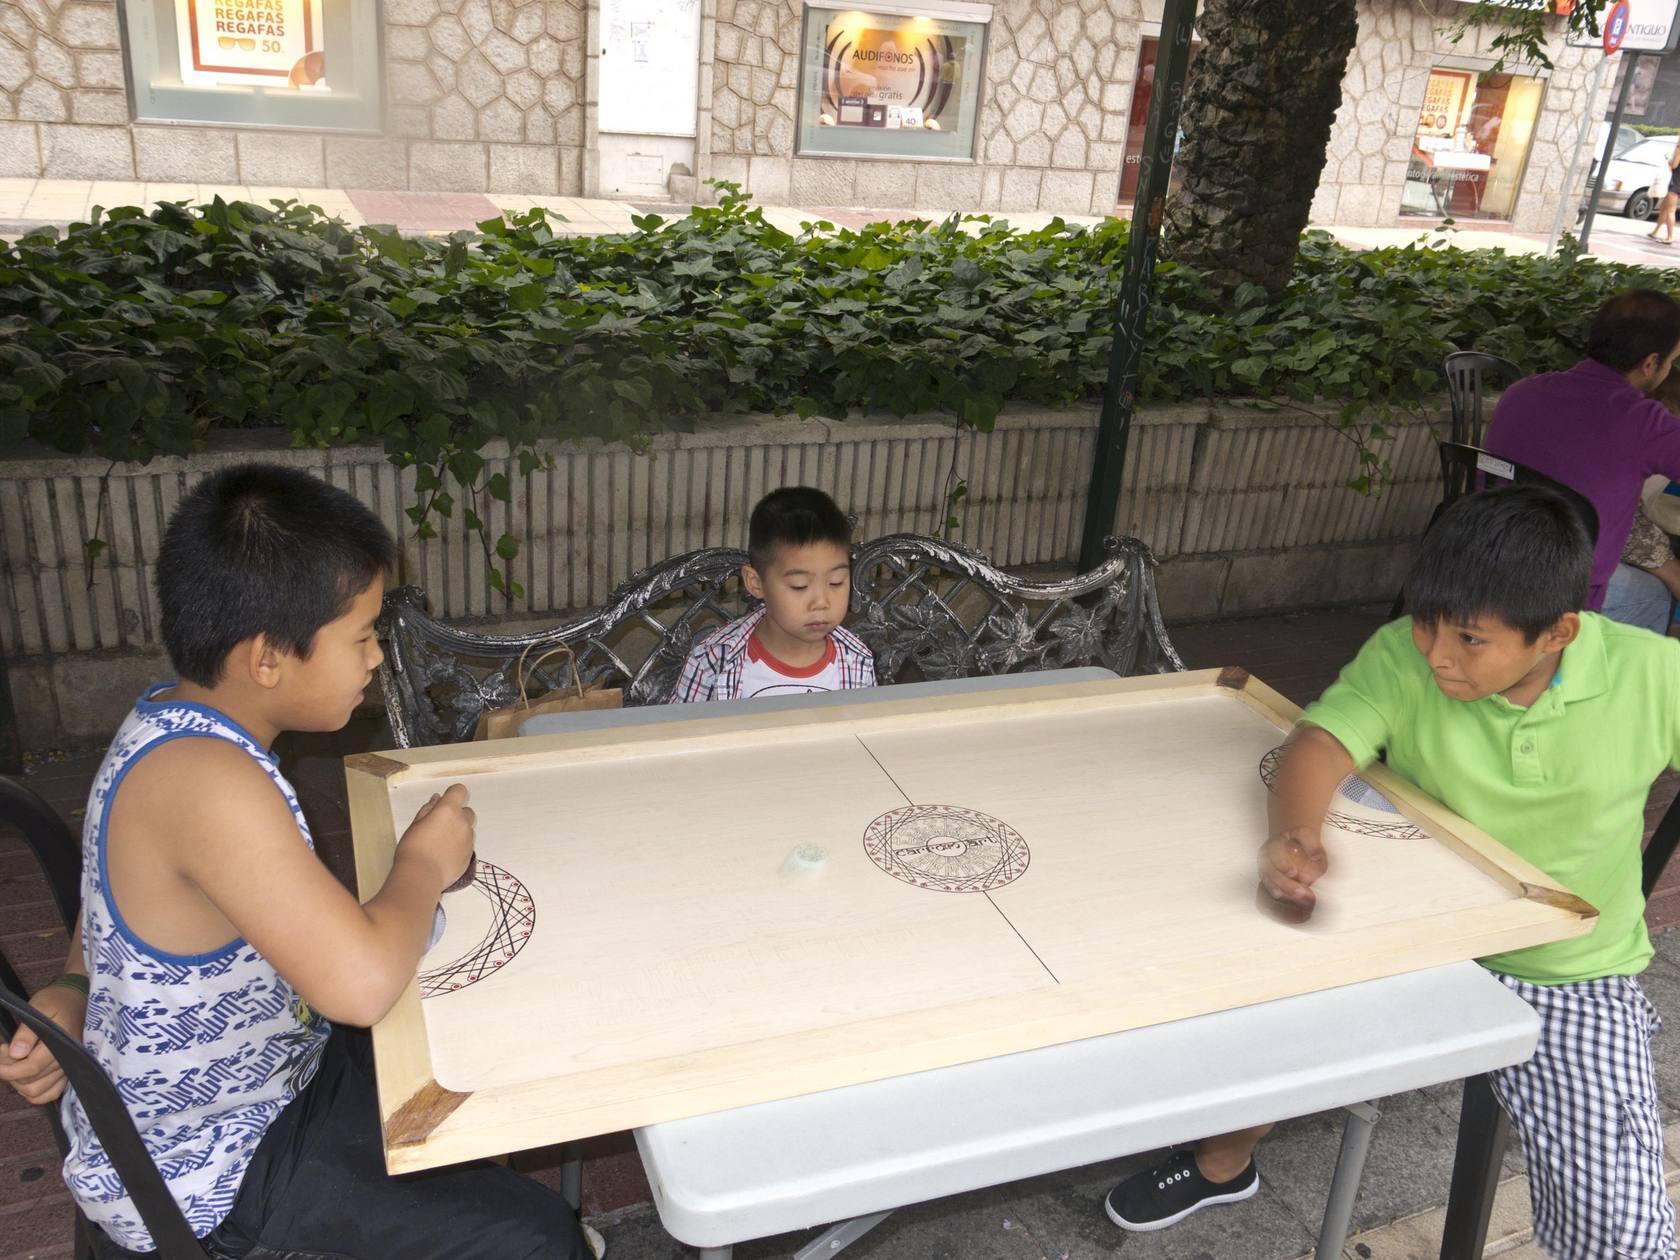 Maratón de juegos de mesa en Badajoz